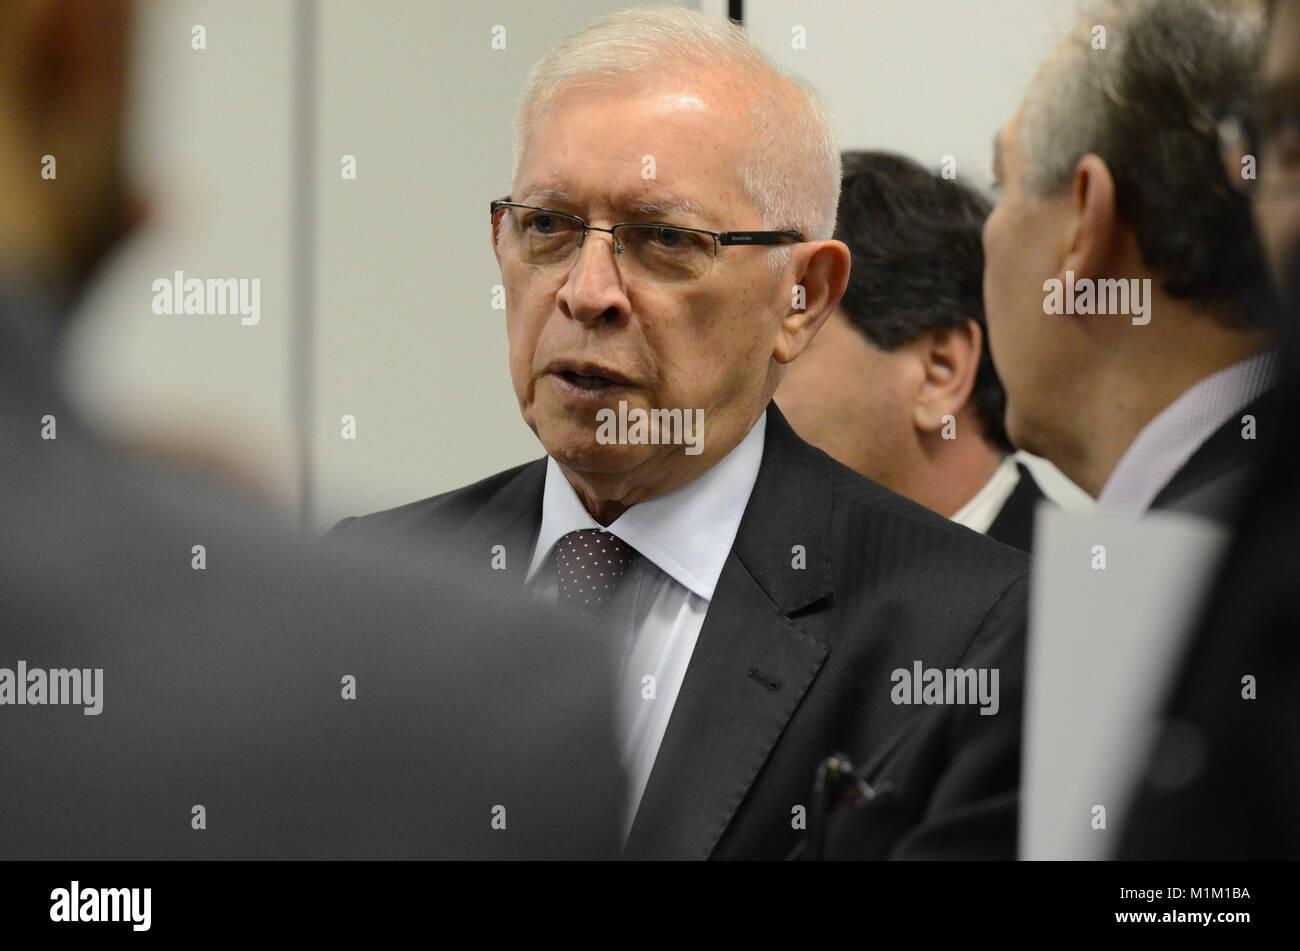 BRASÍLIA, DF - 31.01.2018: DESLIGAMENTO DO SINAL ANALOGICO - The president of Anatel, Juarez Quadros, during - Stock Image